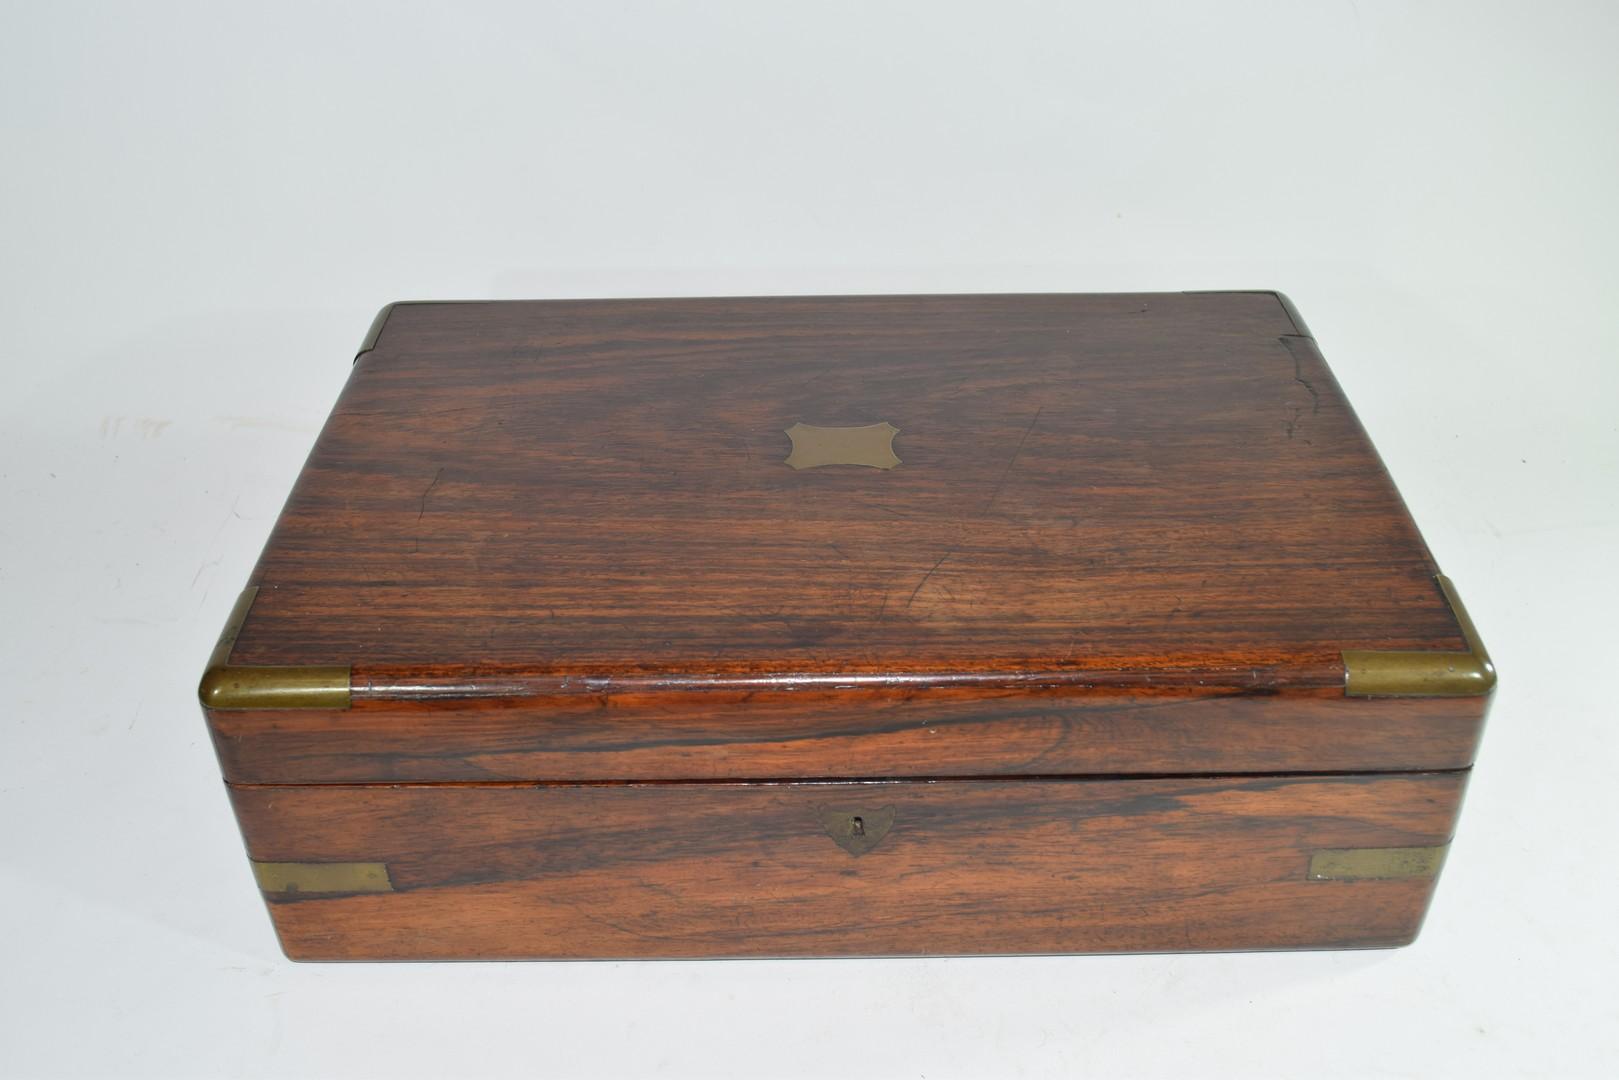 Late 19th century hardwood writing box